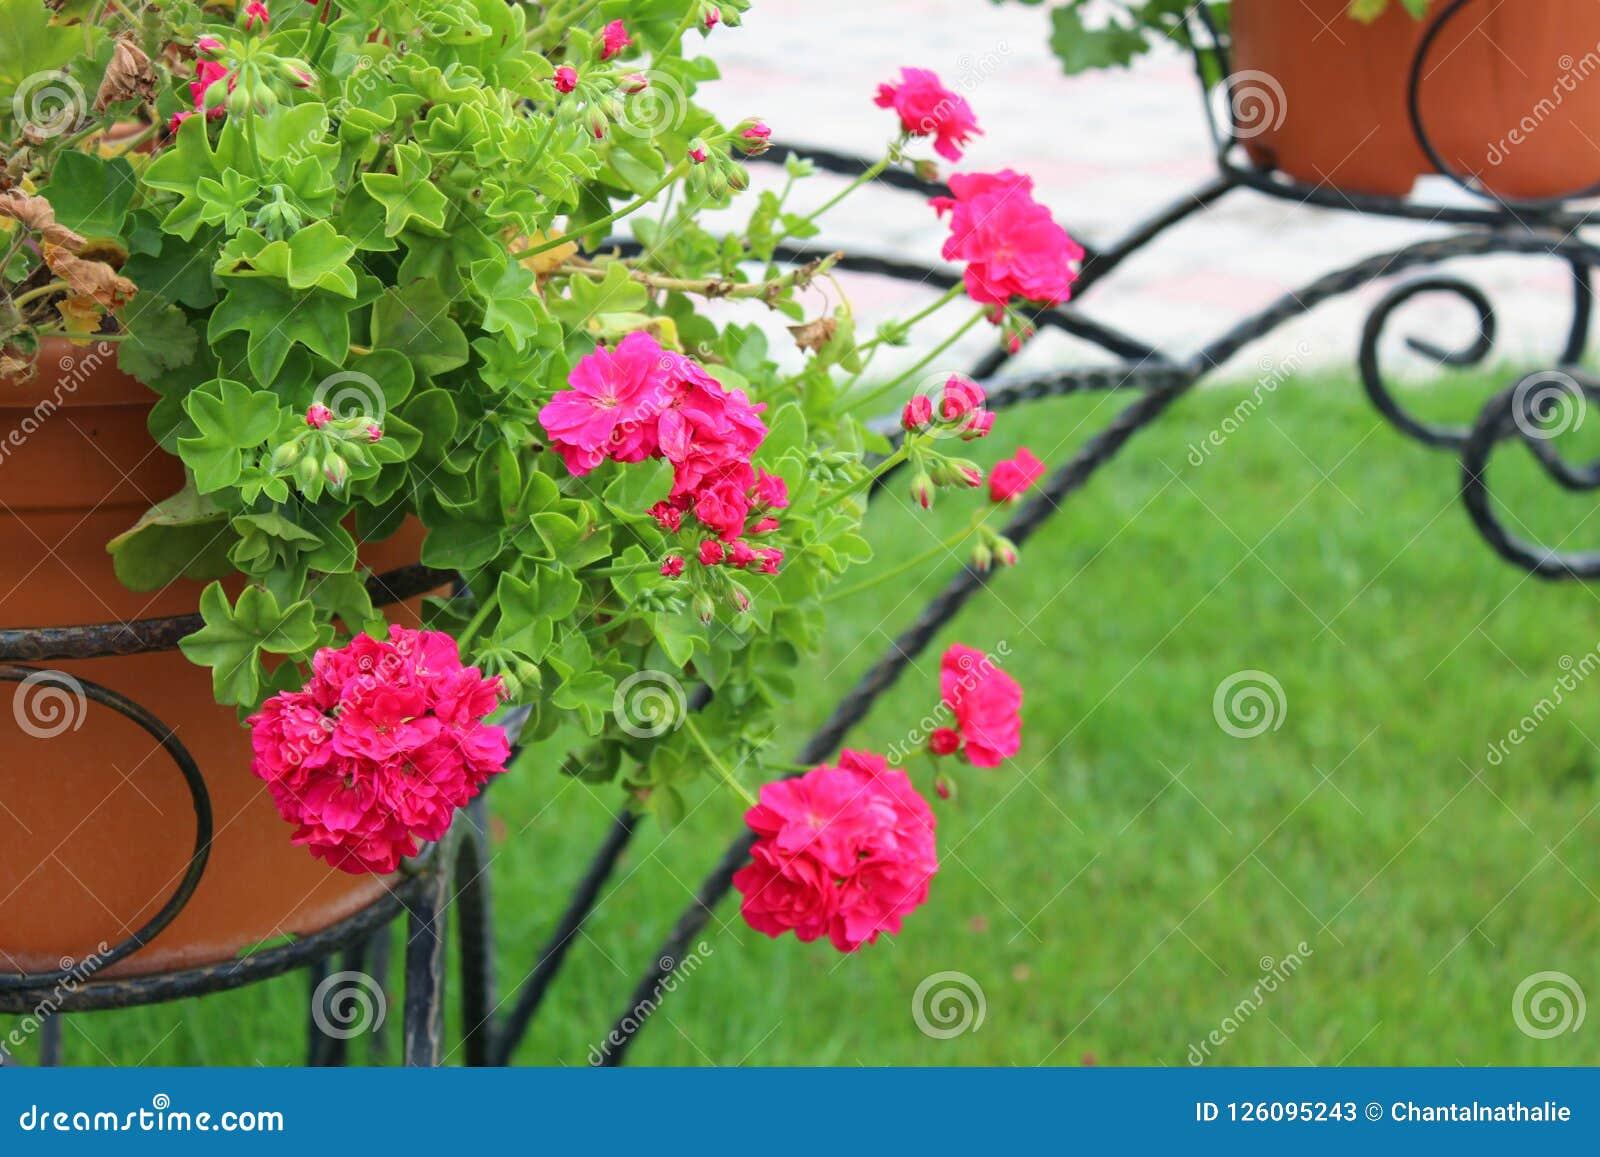 Beautiful geranium flowers